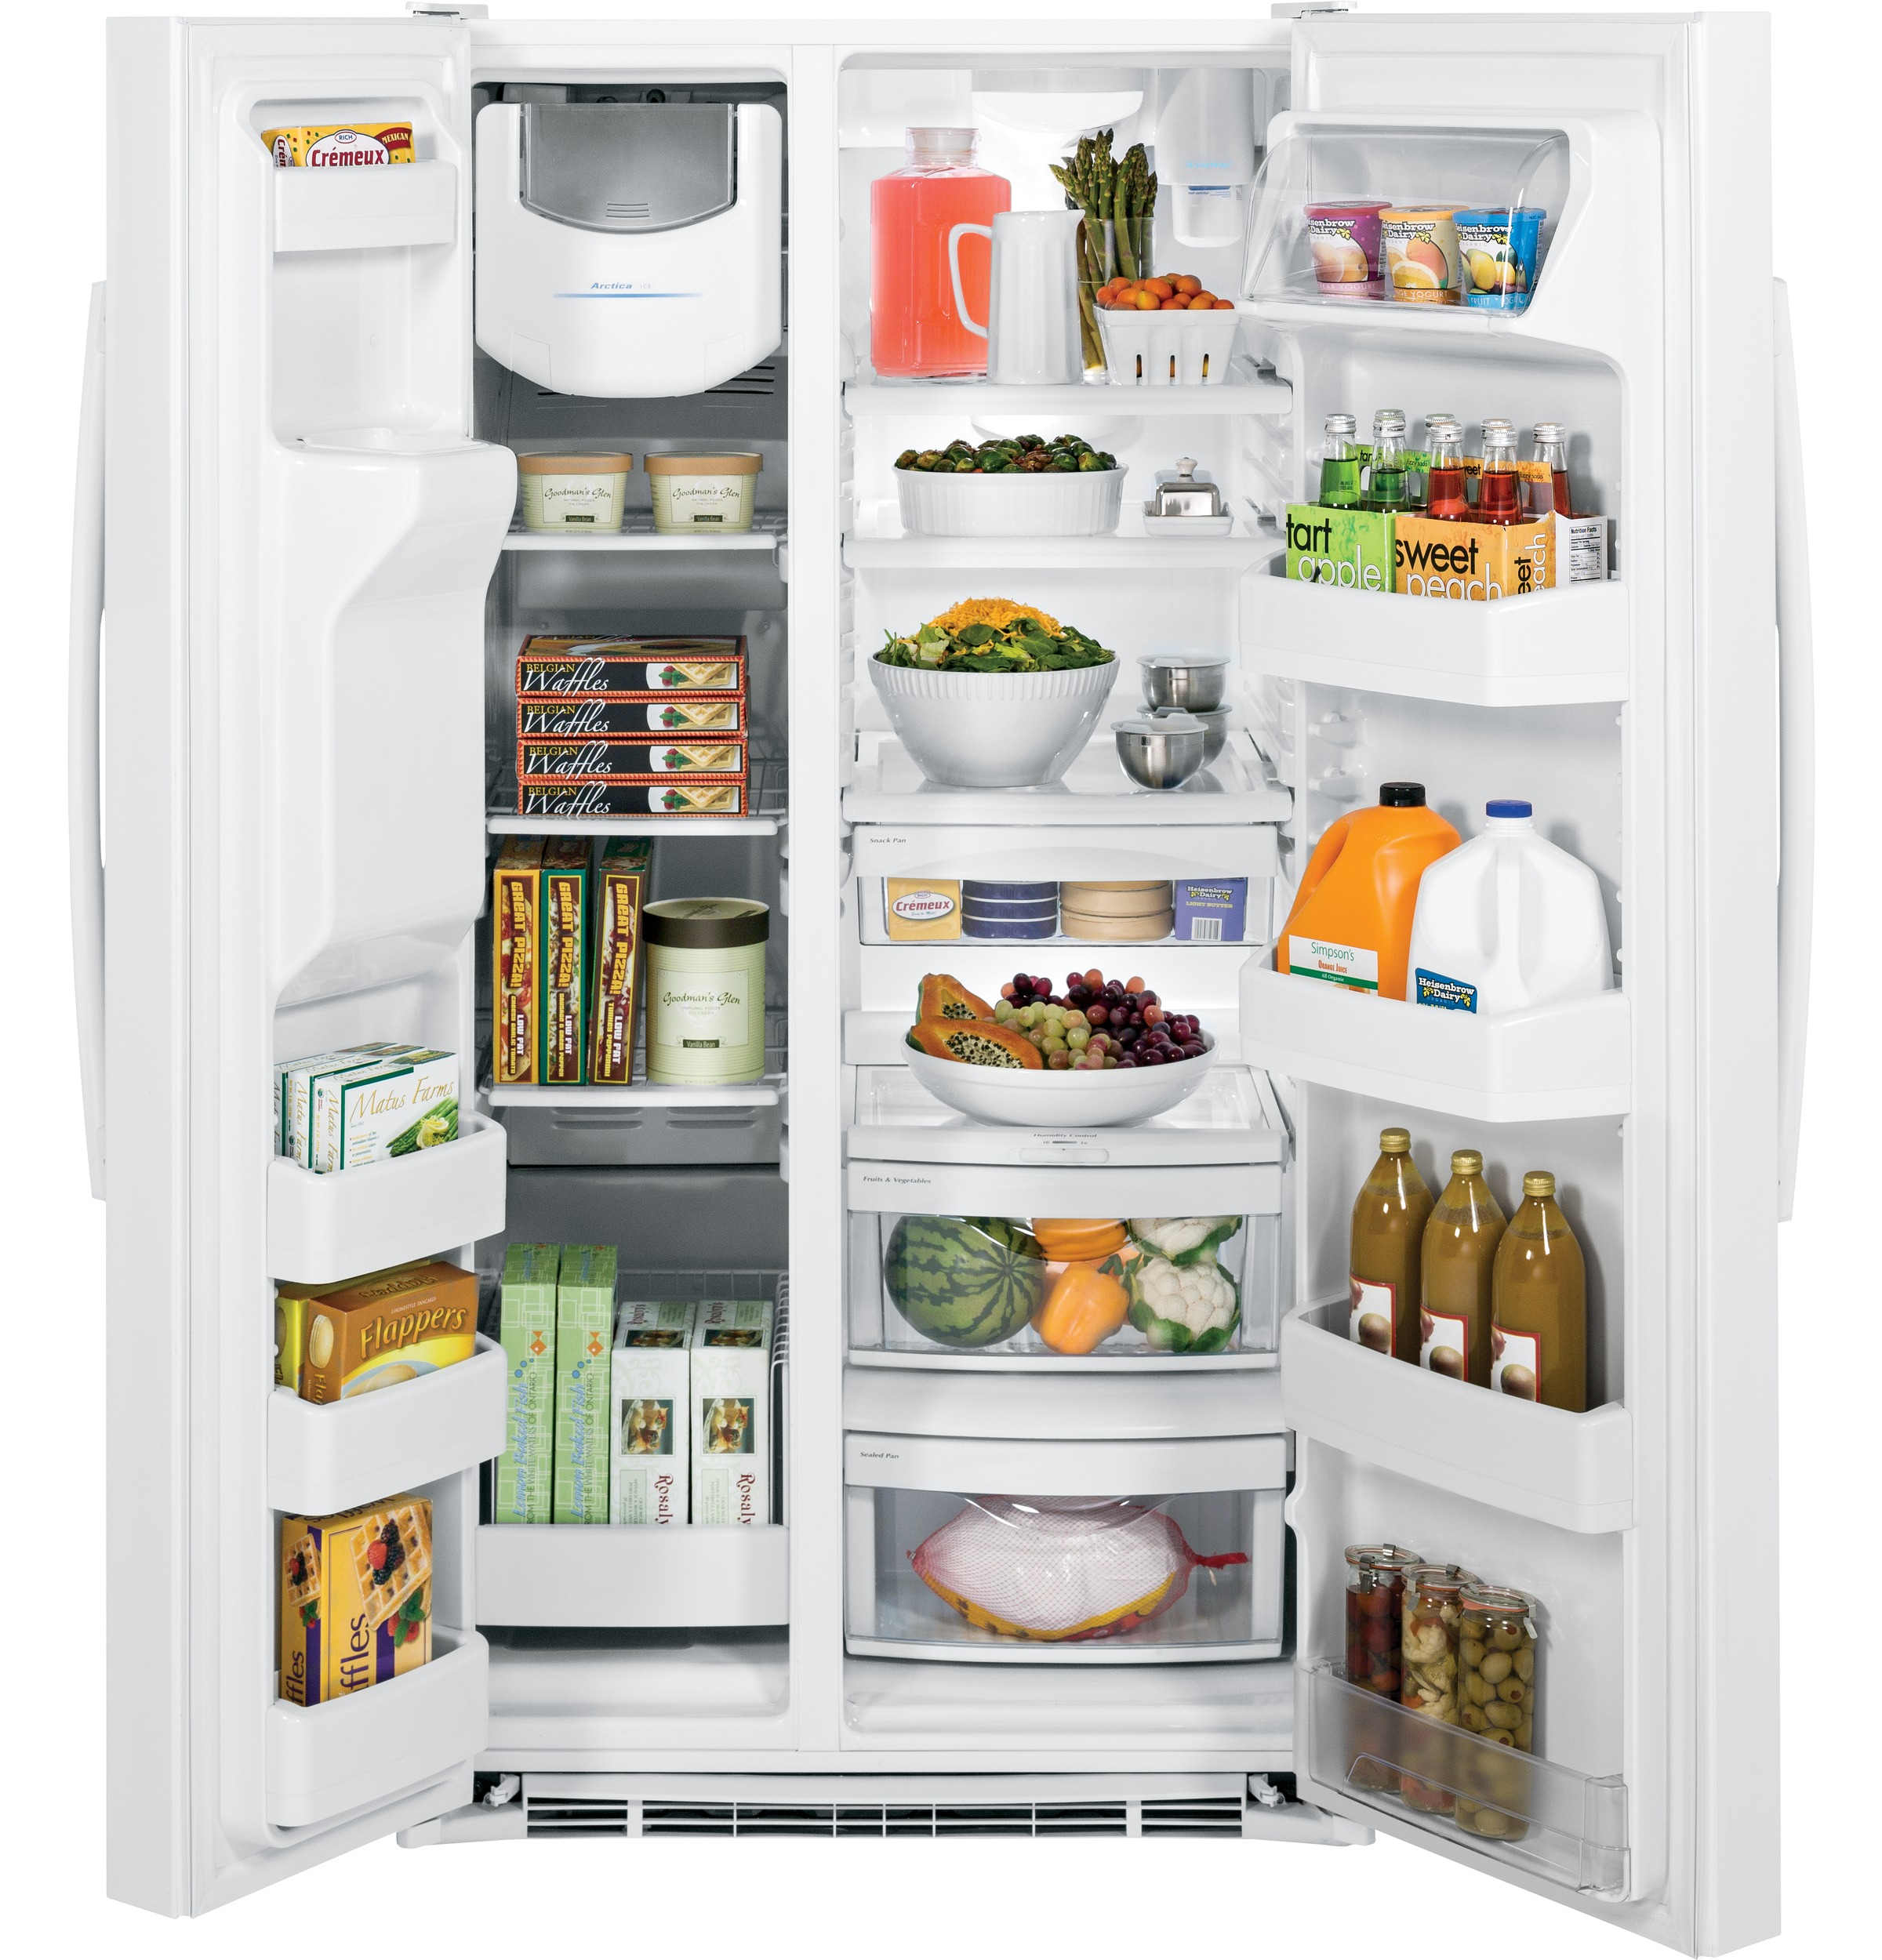 Model: GSS25GGHWW   GE GE® 25.3 Cu. Ft. Side-By-Side Refrigerator